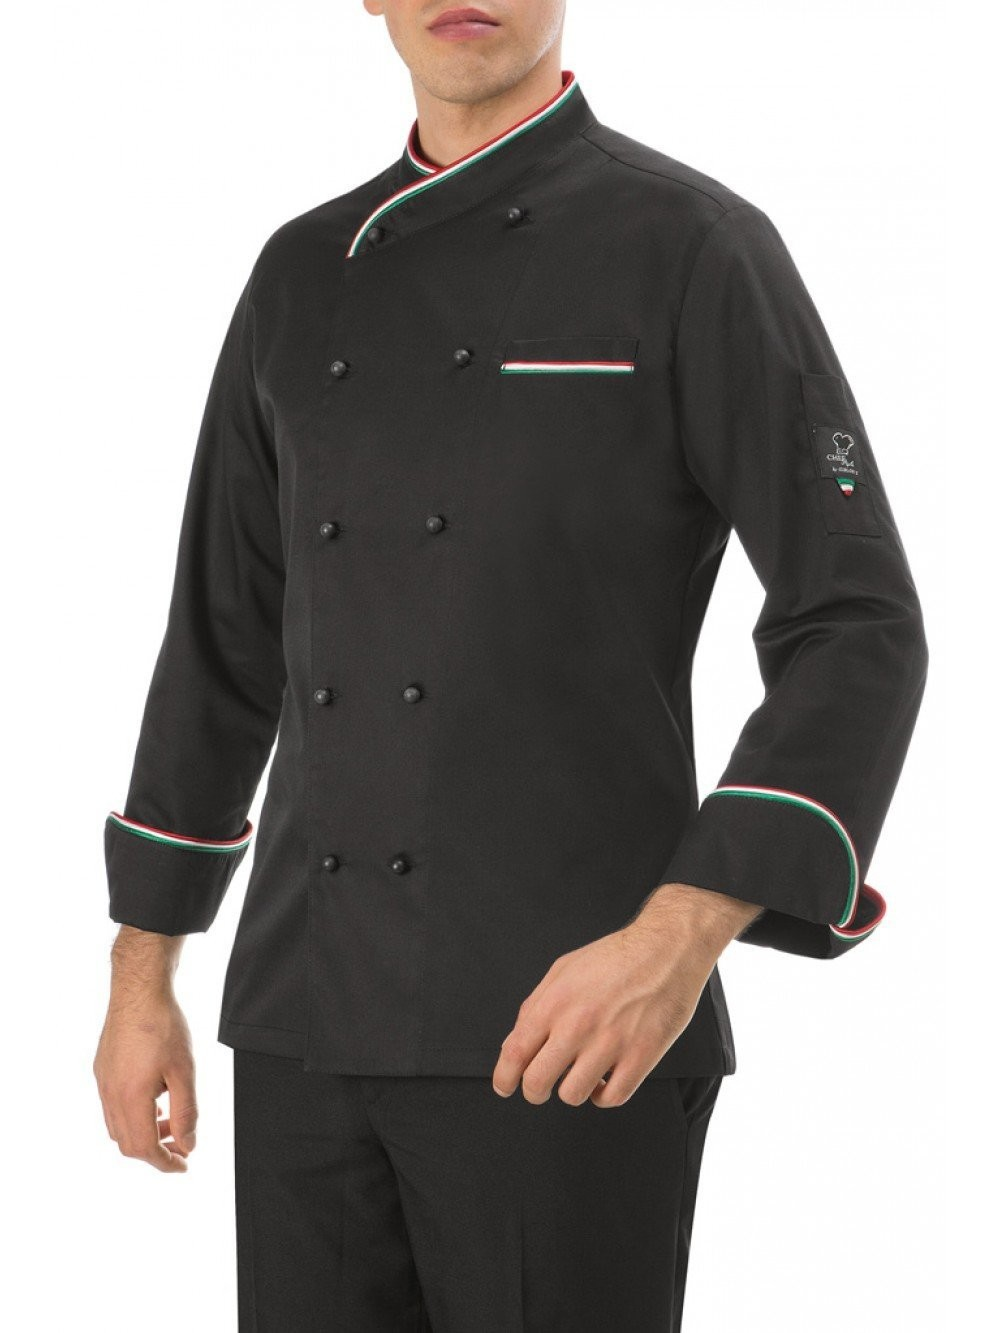 giacche da cucina giblor's nera